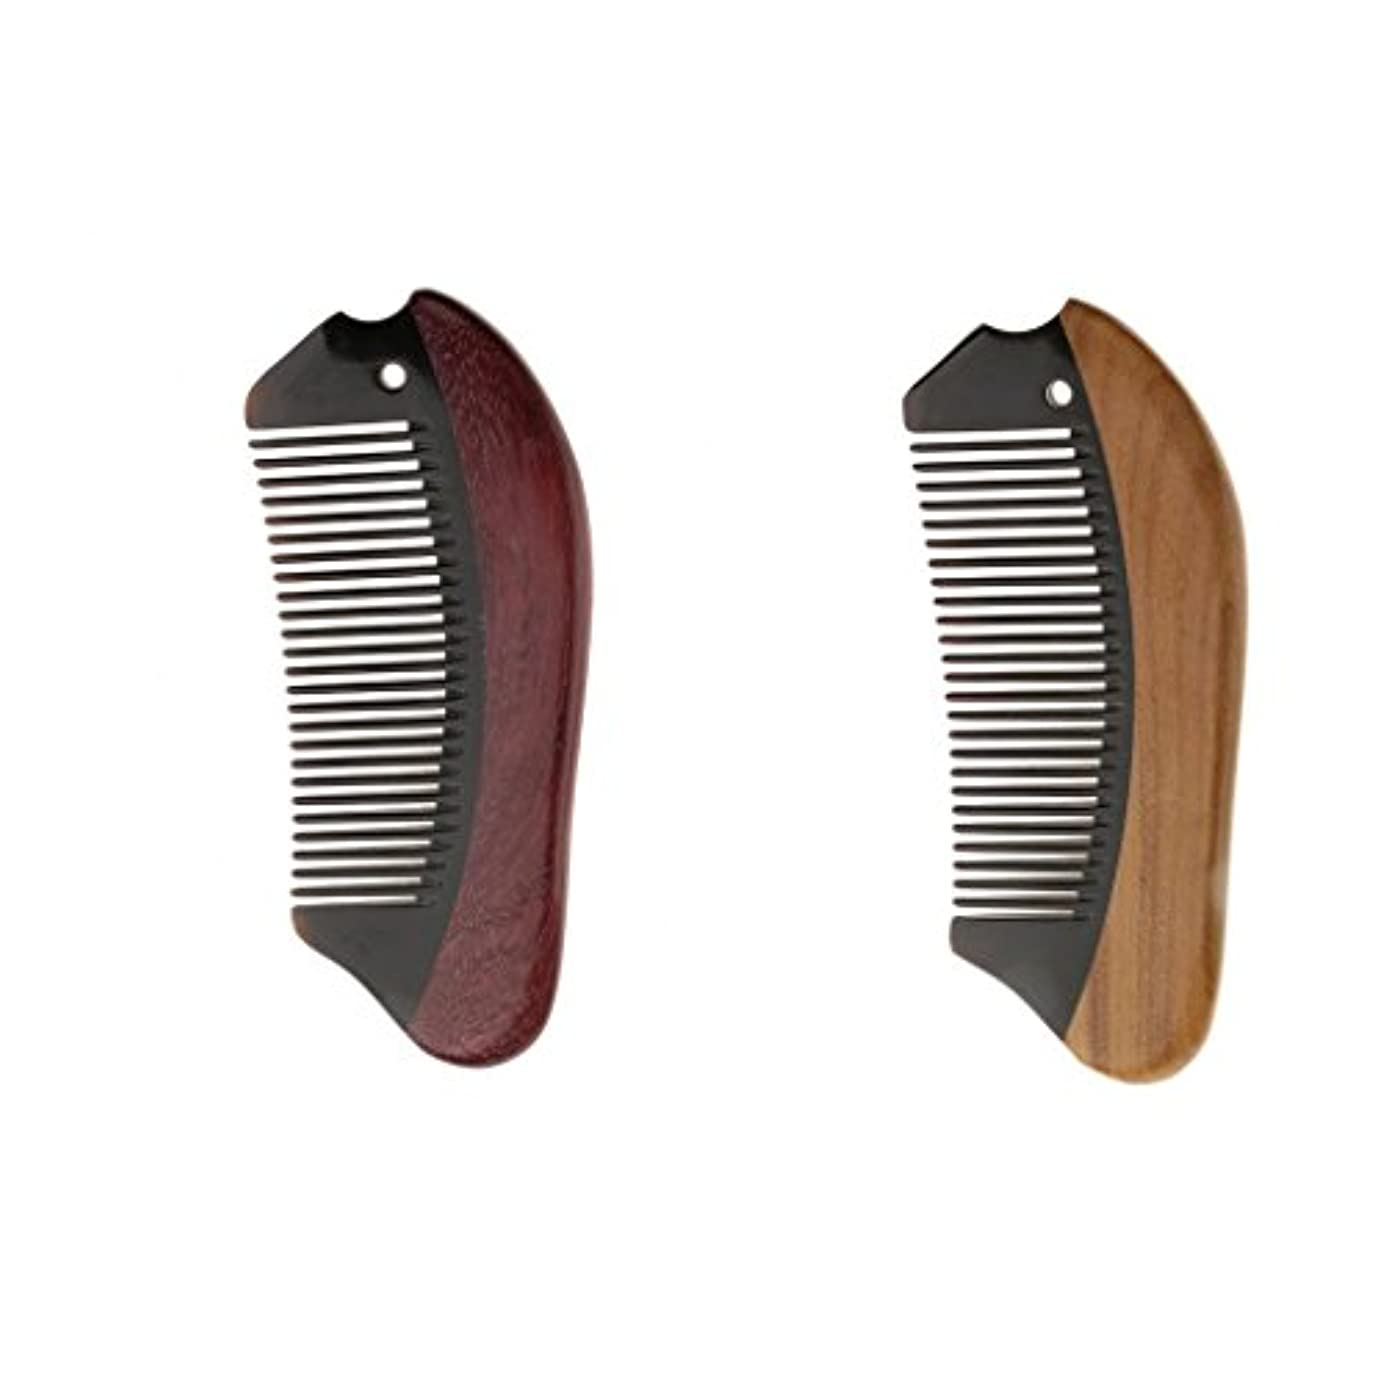 KOZEEY 2個 木製 櫛 コーム ヘアダイコーム ブラシ 静電気防止 マッサージ 滑らか 快適